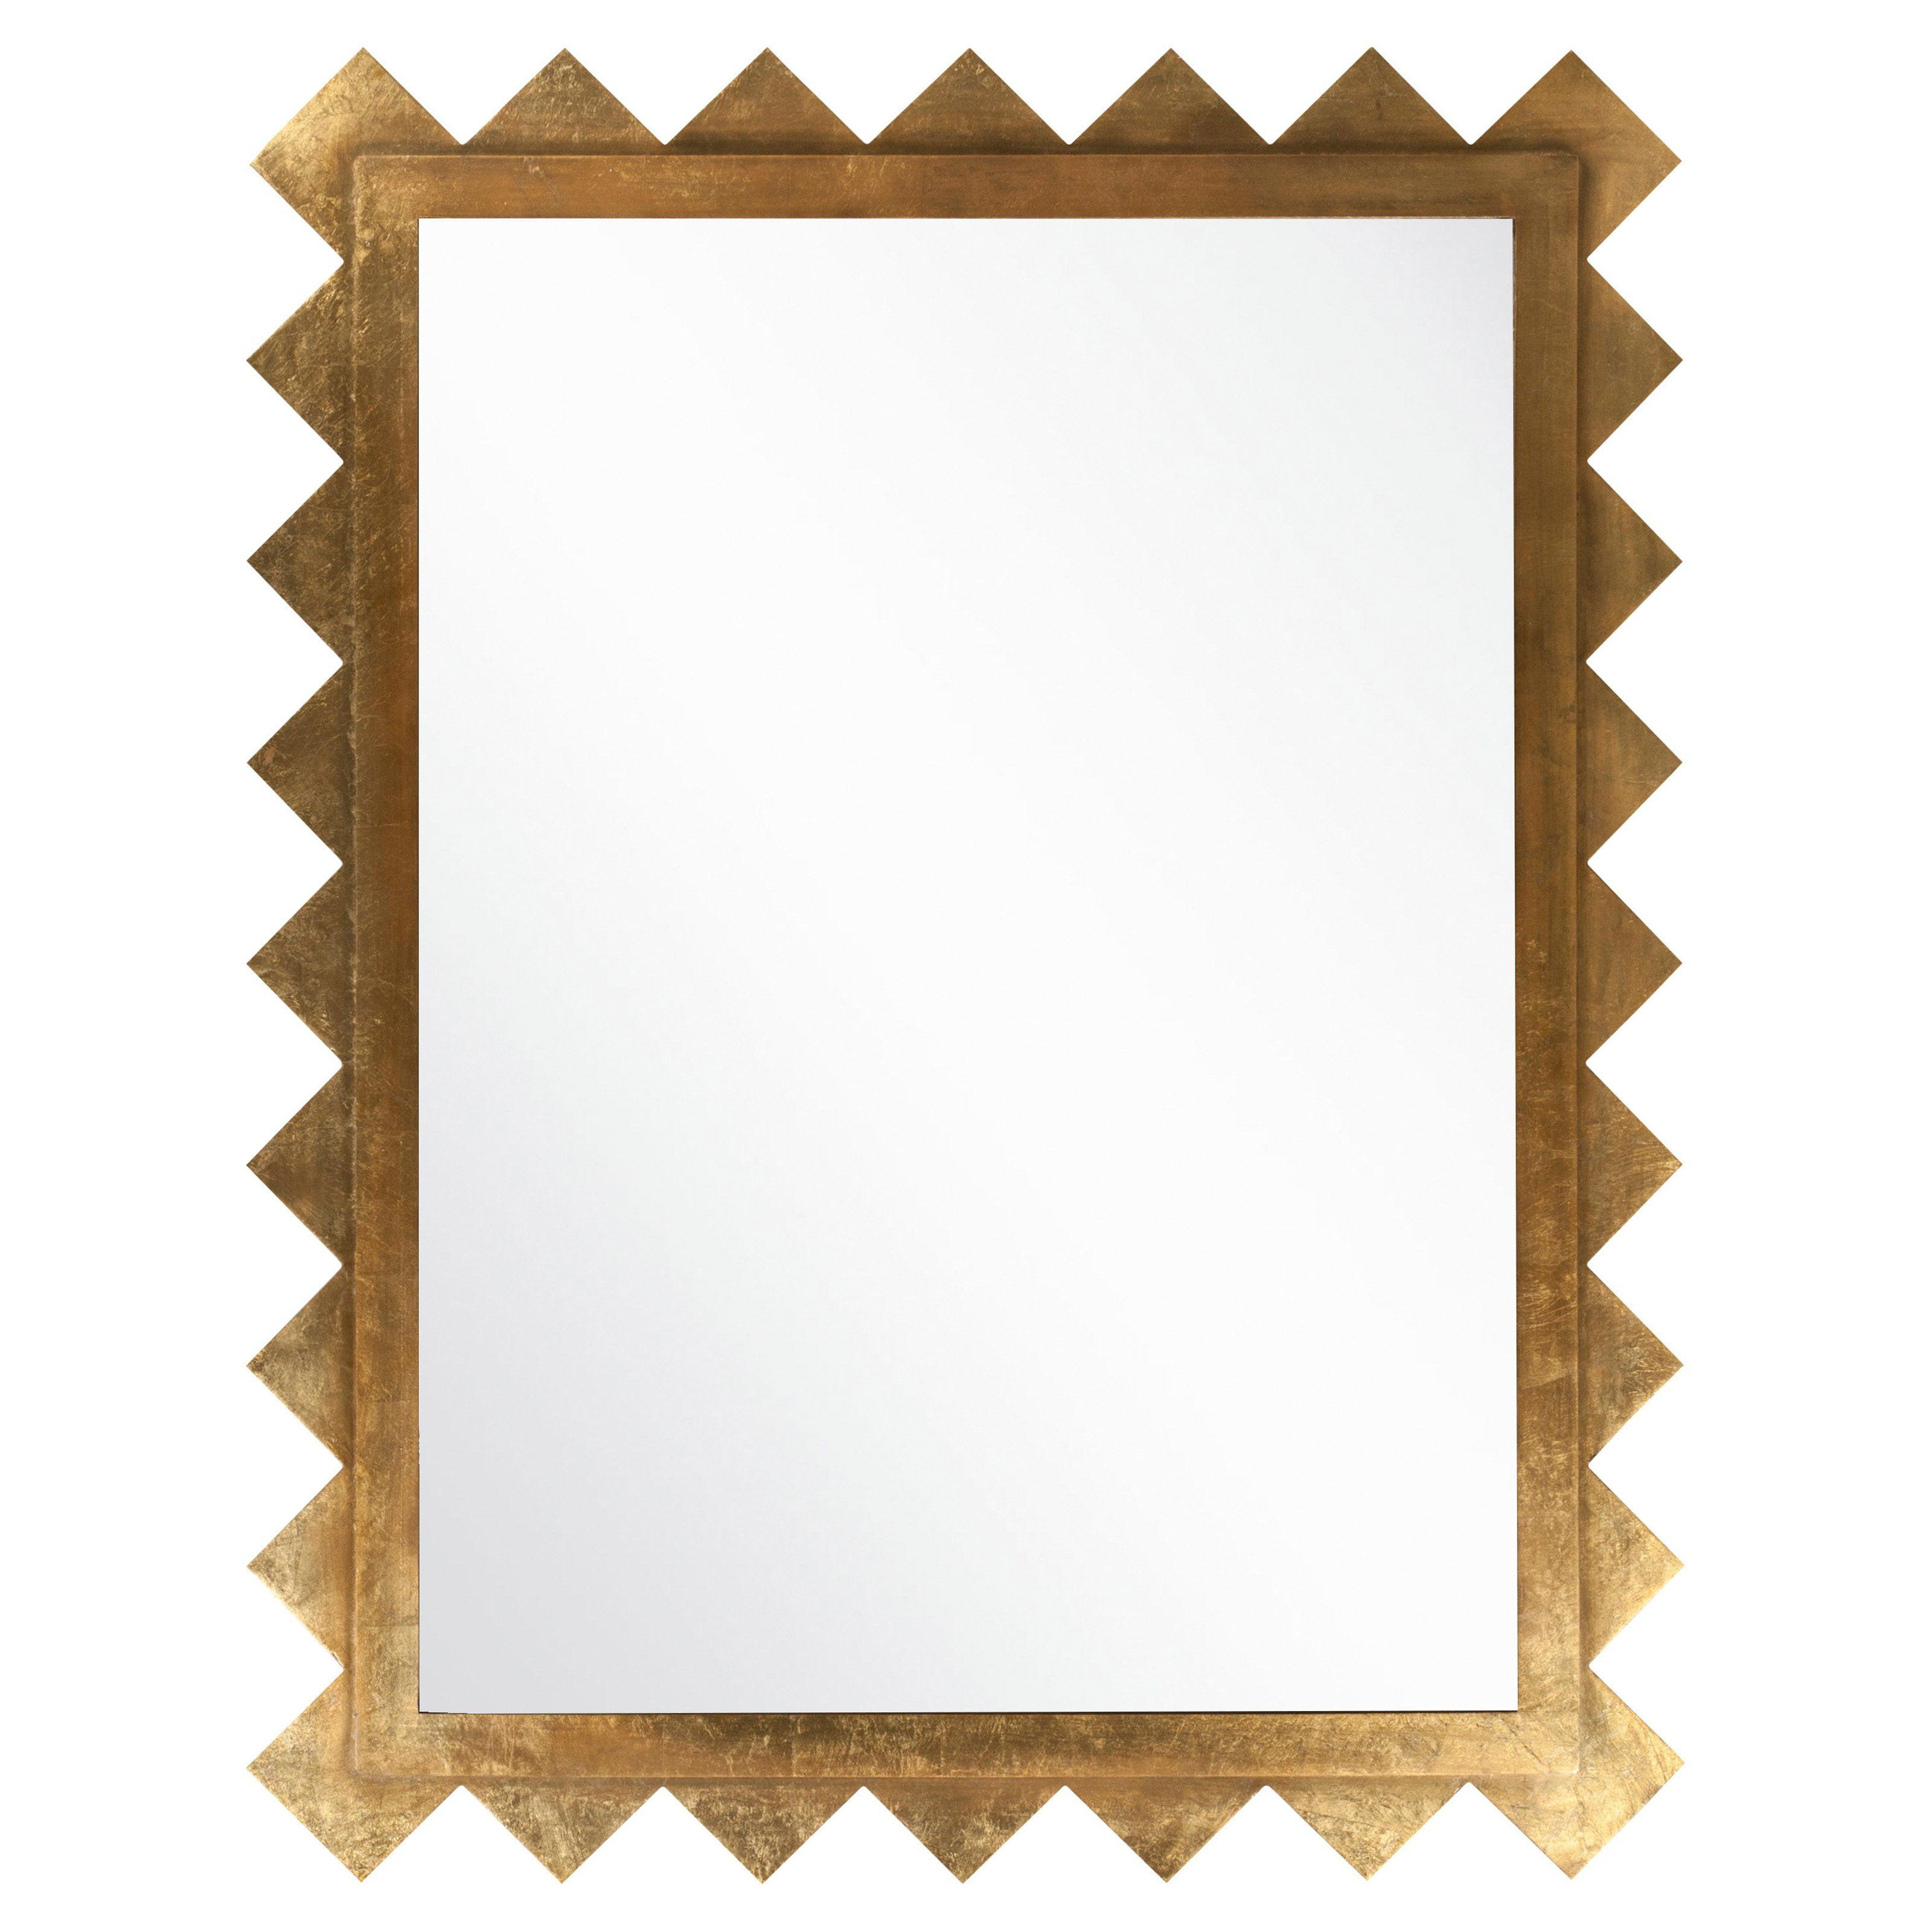 Surya Gold Deco Wall Mirror 45W x 57H in. by Surya